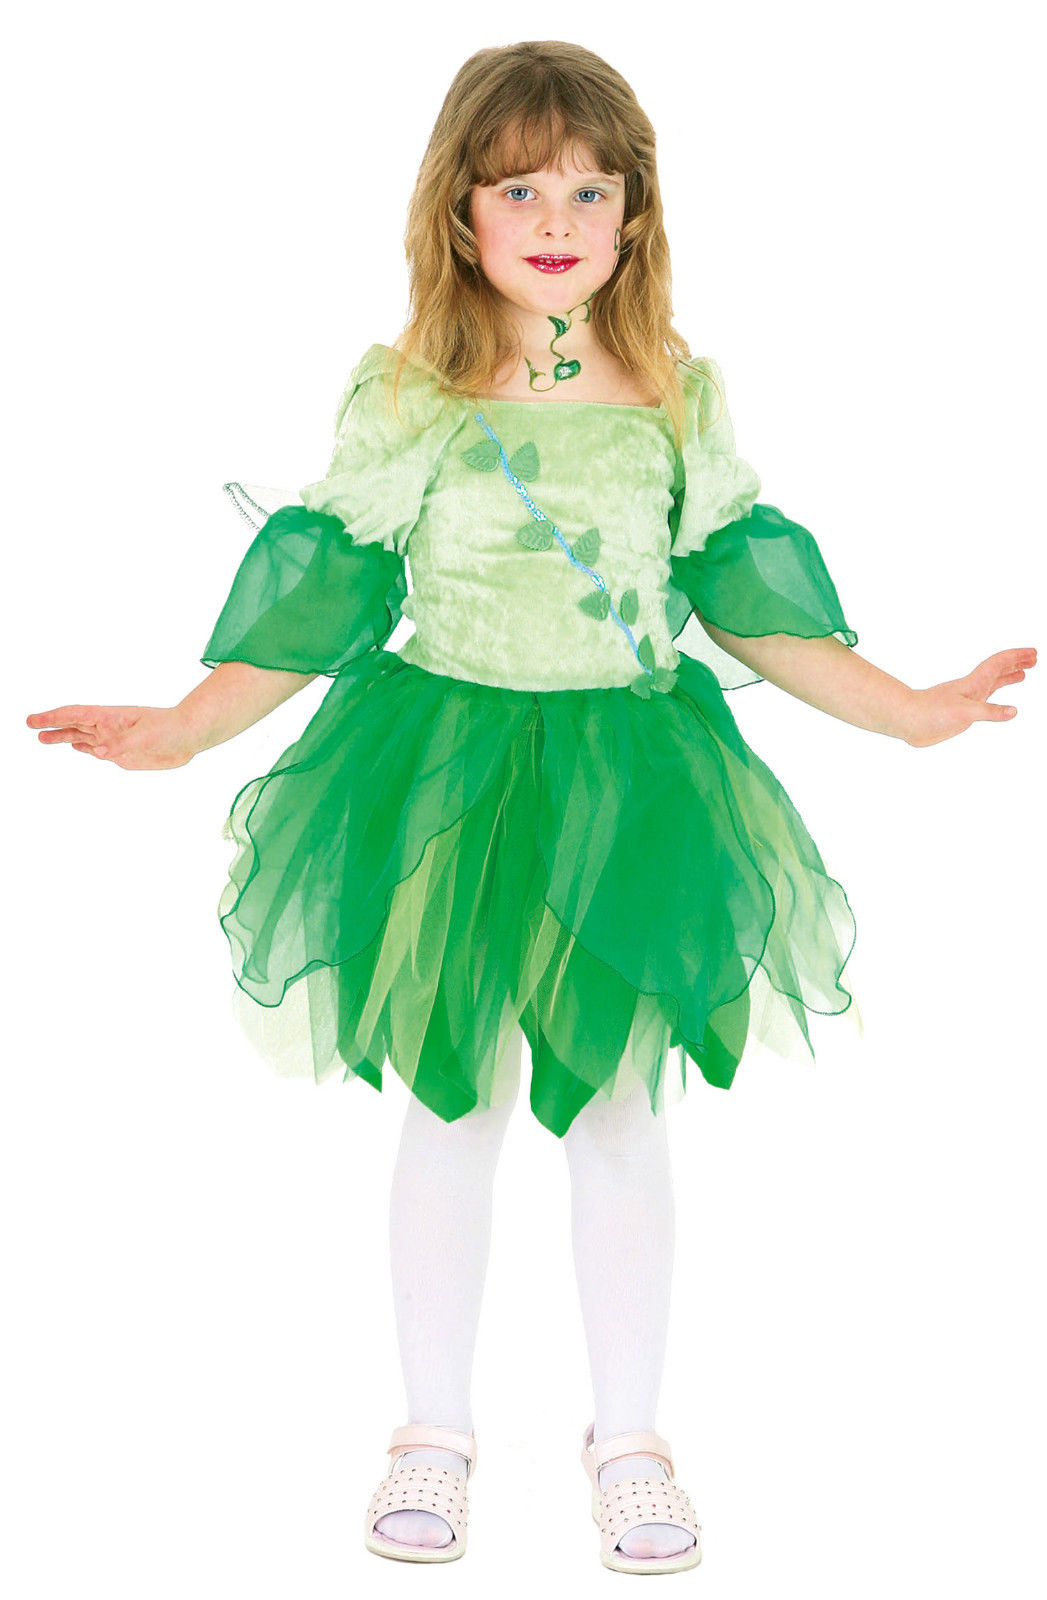 Feen Kleid Grun Kinderkostum Madchen Kinderkostume Kostume Schuhe Kostume Accessoires Happy Hour Shop